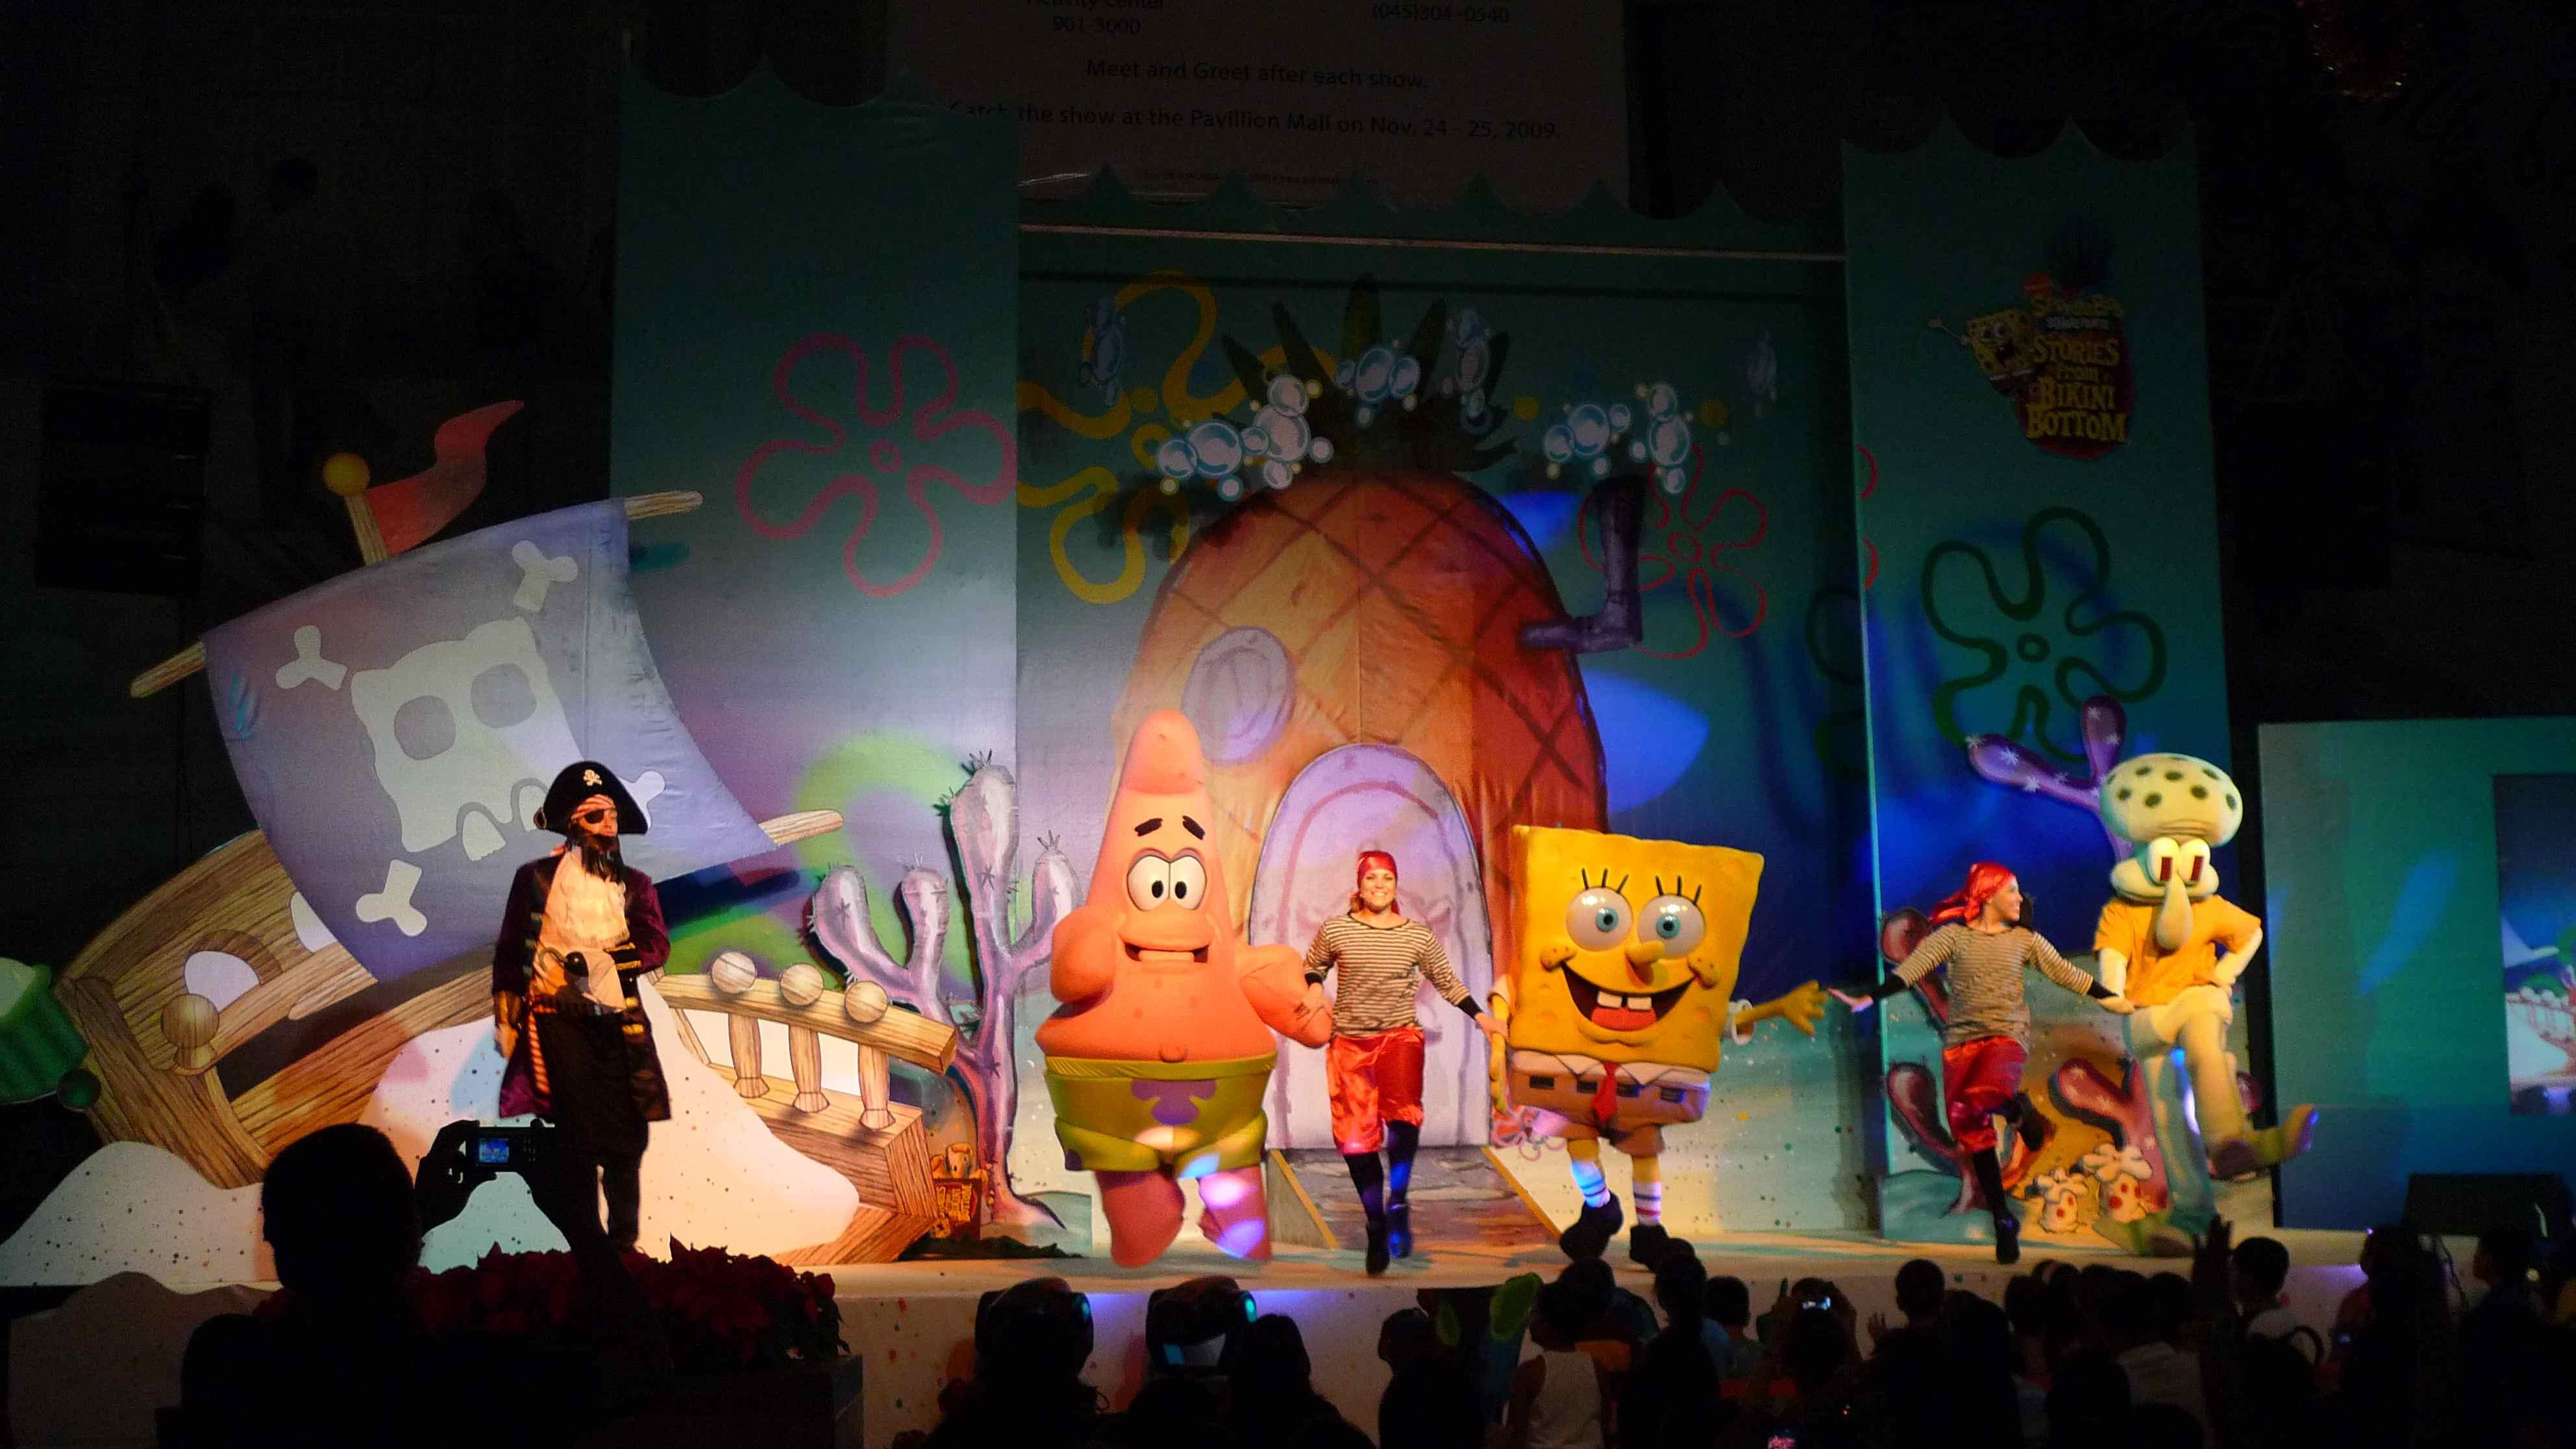 The One Where Spongebob Boarded Superstar Virgo The